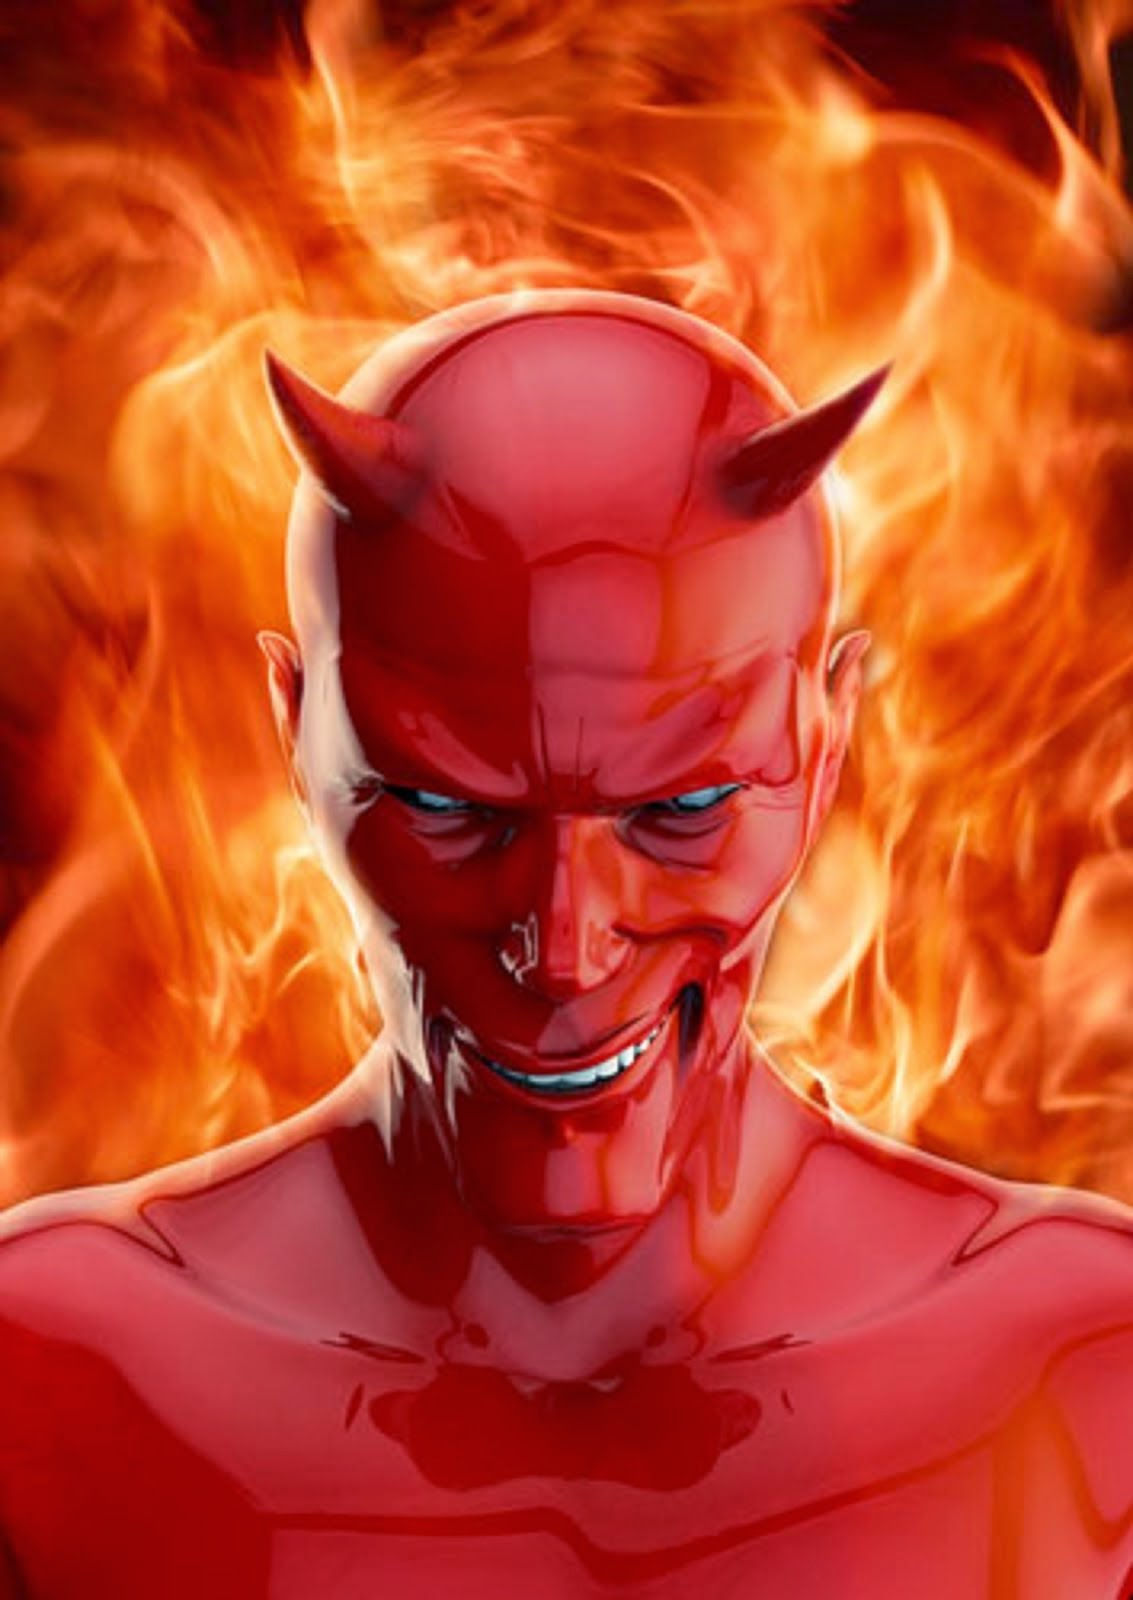 THE DEVIL - SATAN